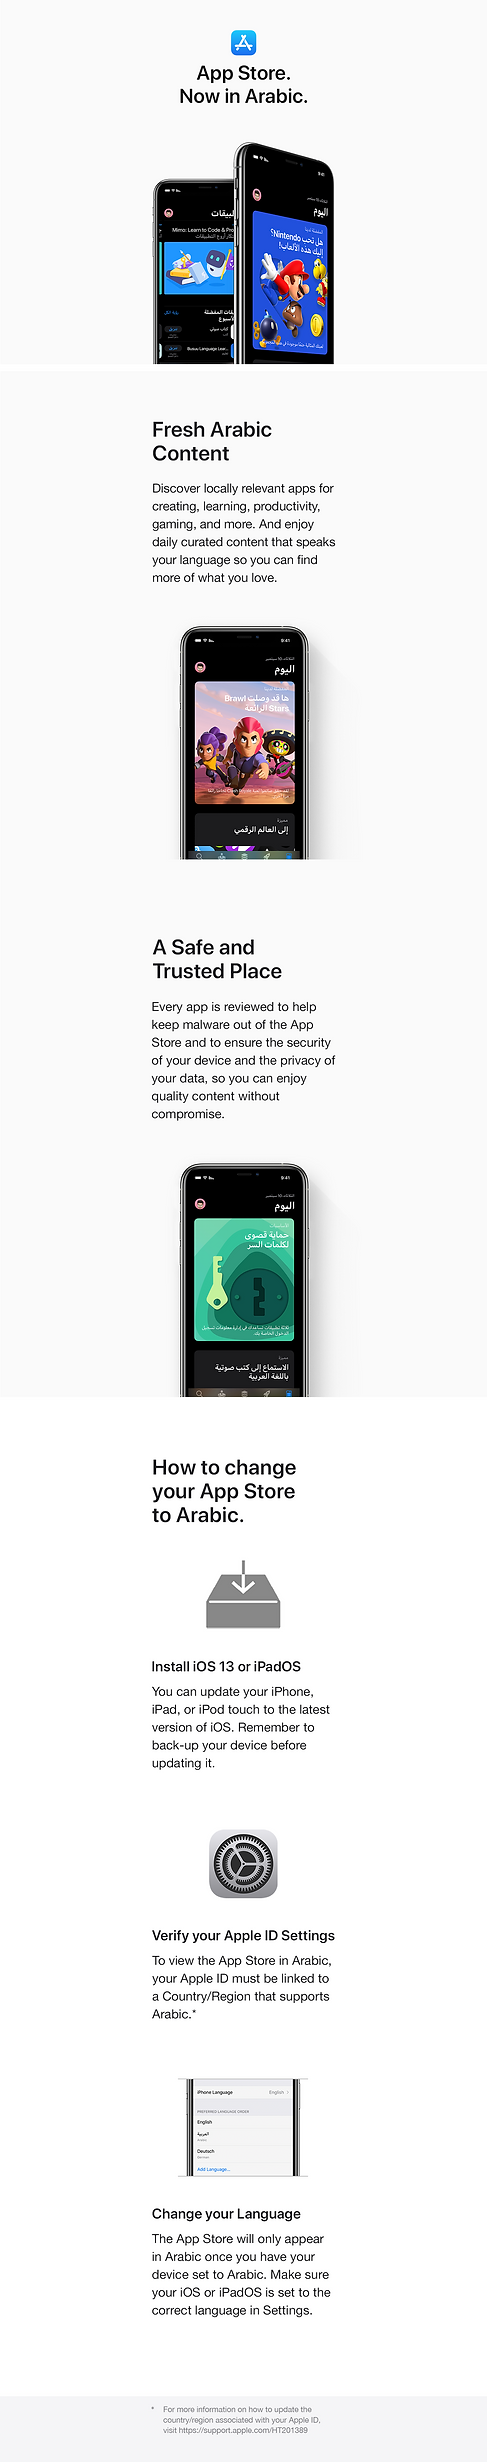 MEEN-ArabicAppStore-Landing-Page-S_v4.pn